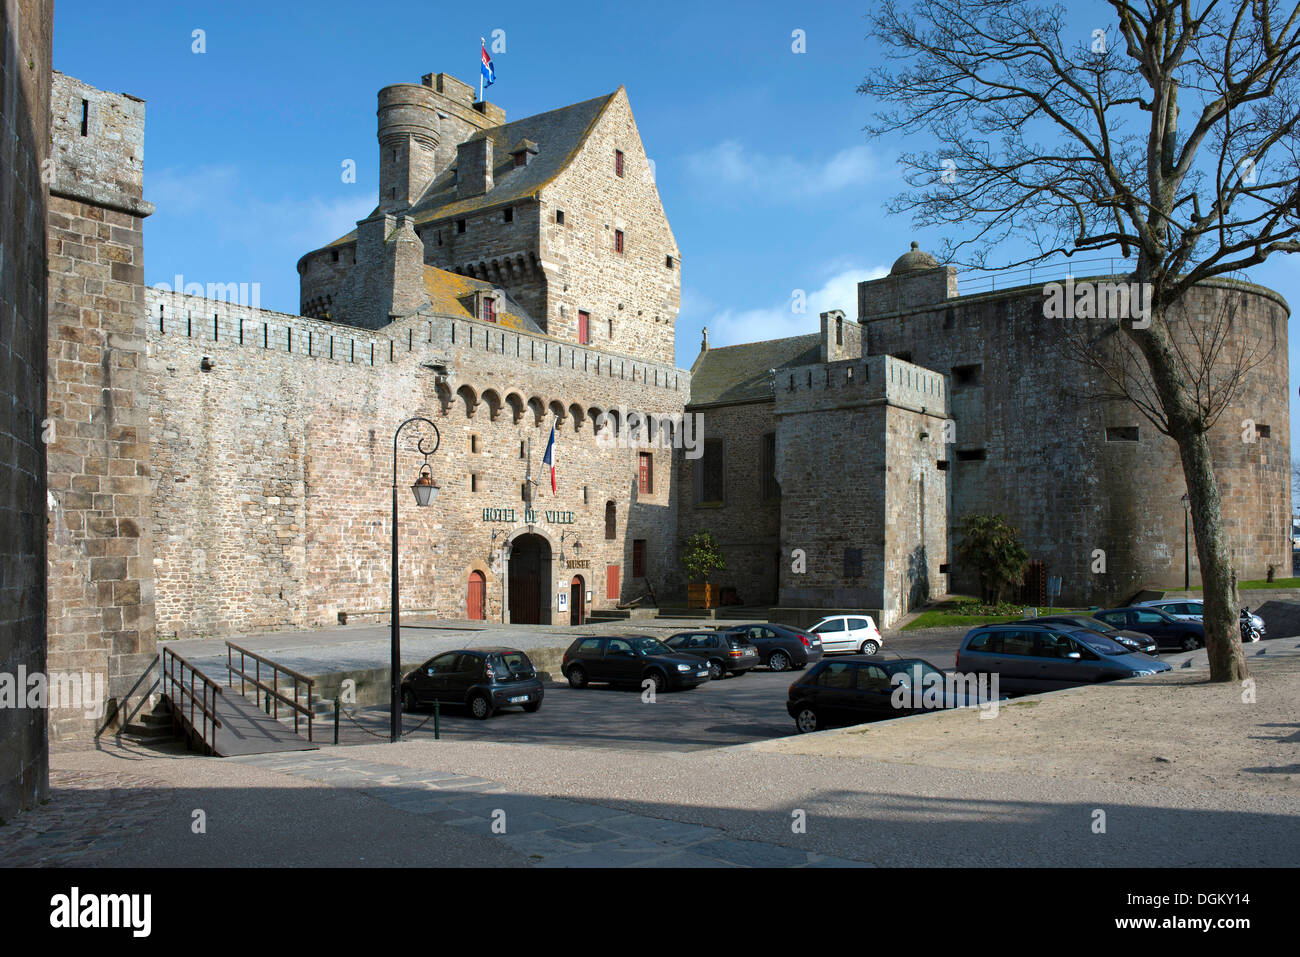 Rathaus, St. Malo, Bretagne, Frankreich, Europa Stockbild